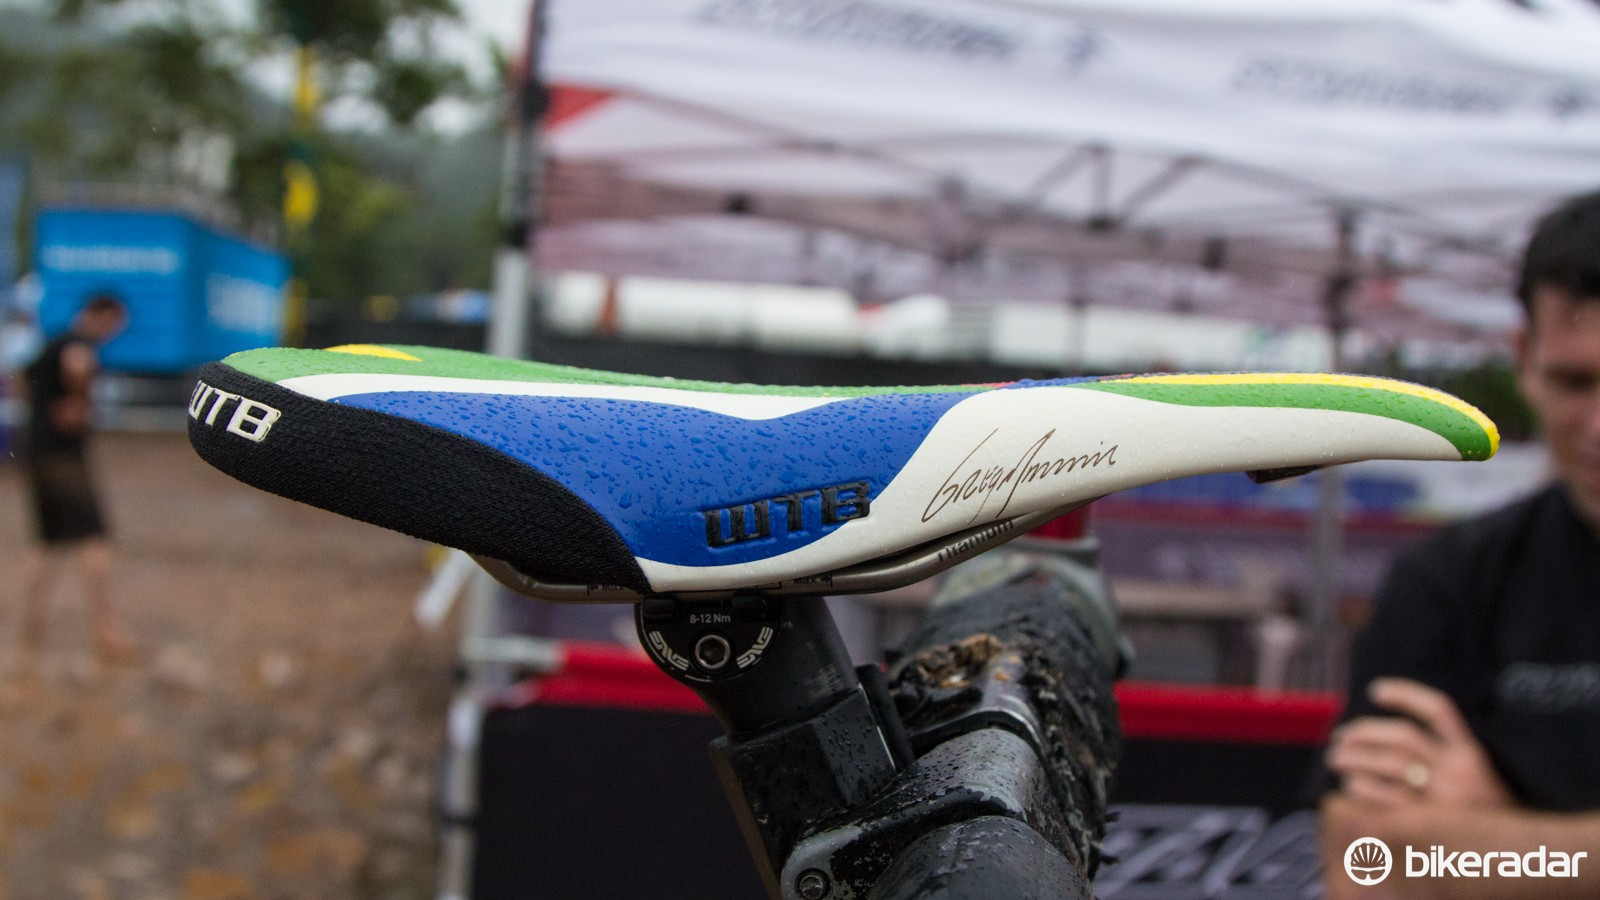 A custom covered WTB Silverado saddle for the World Champ